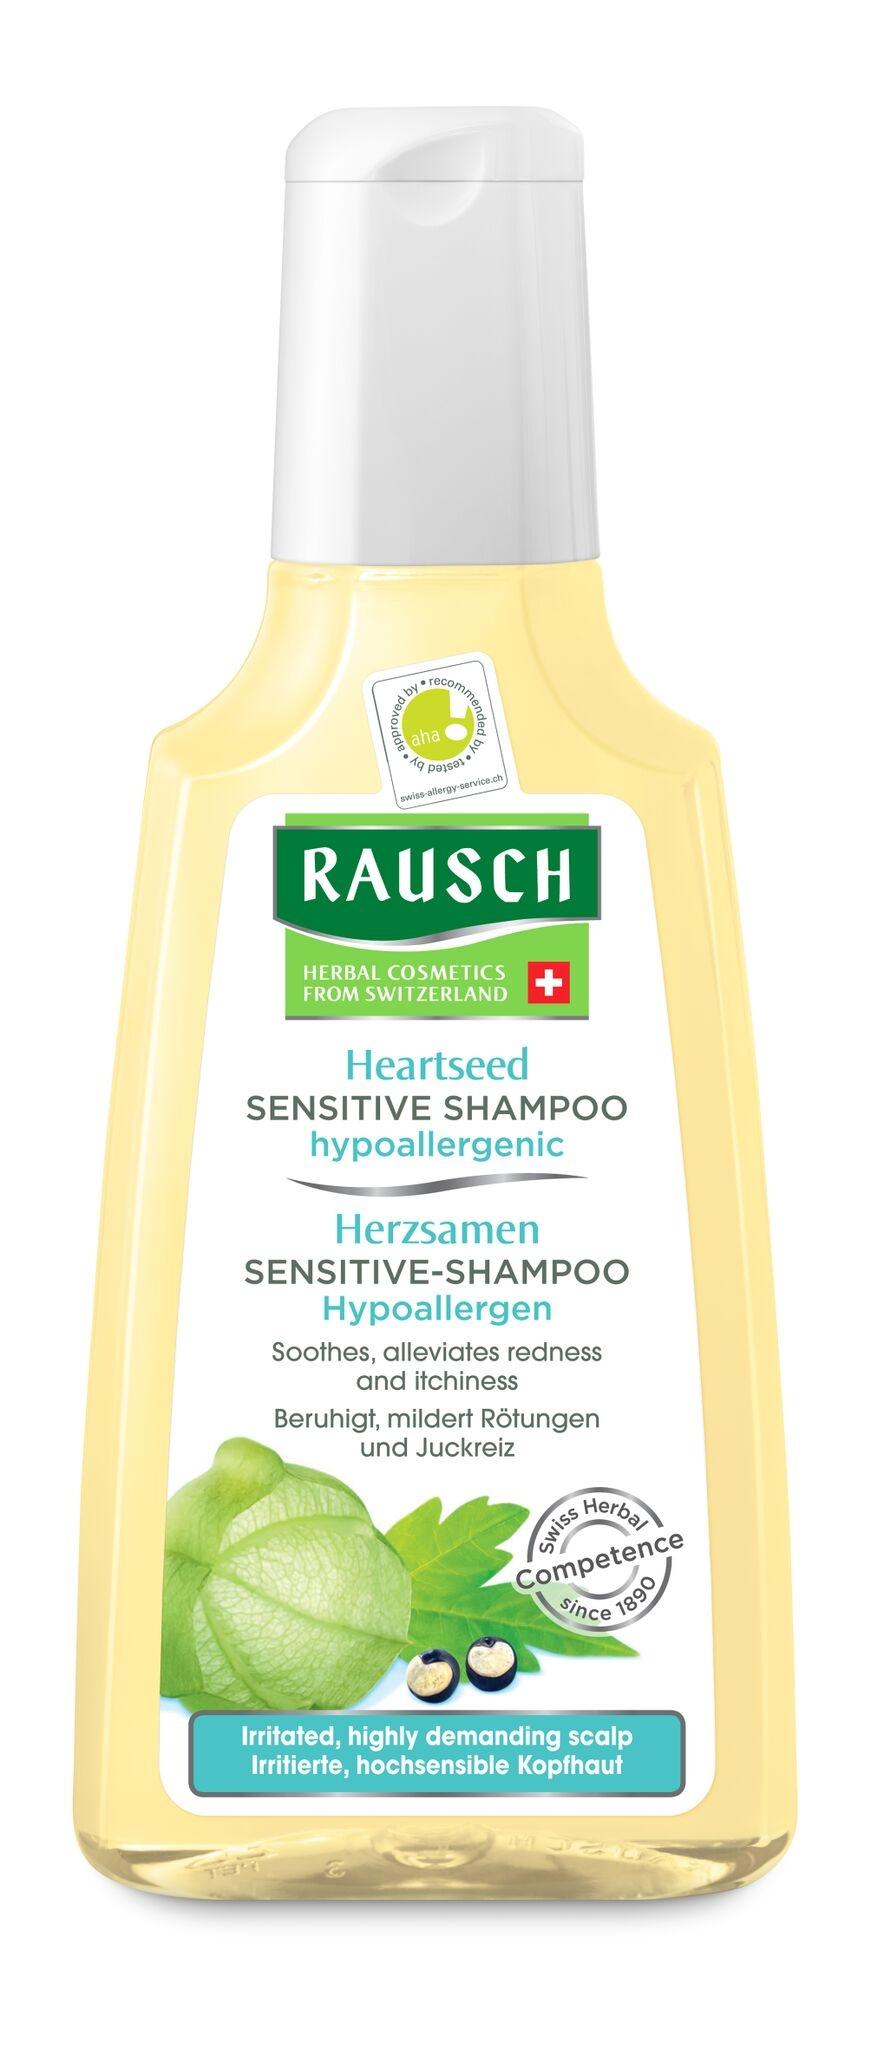 Rausch Heartseed Sensitives Shampoo For Irritated Scalp 200mL